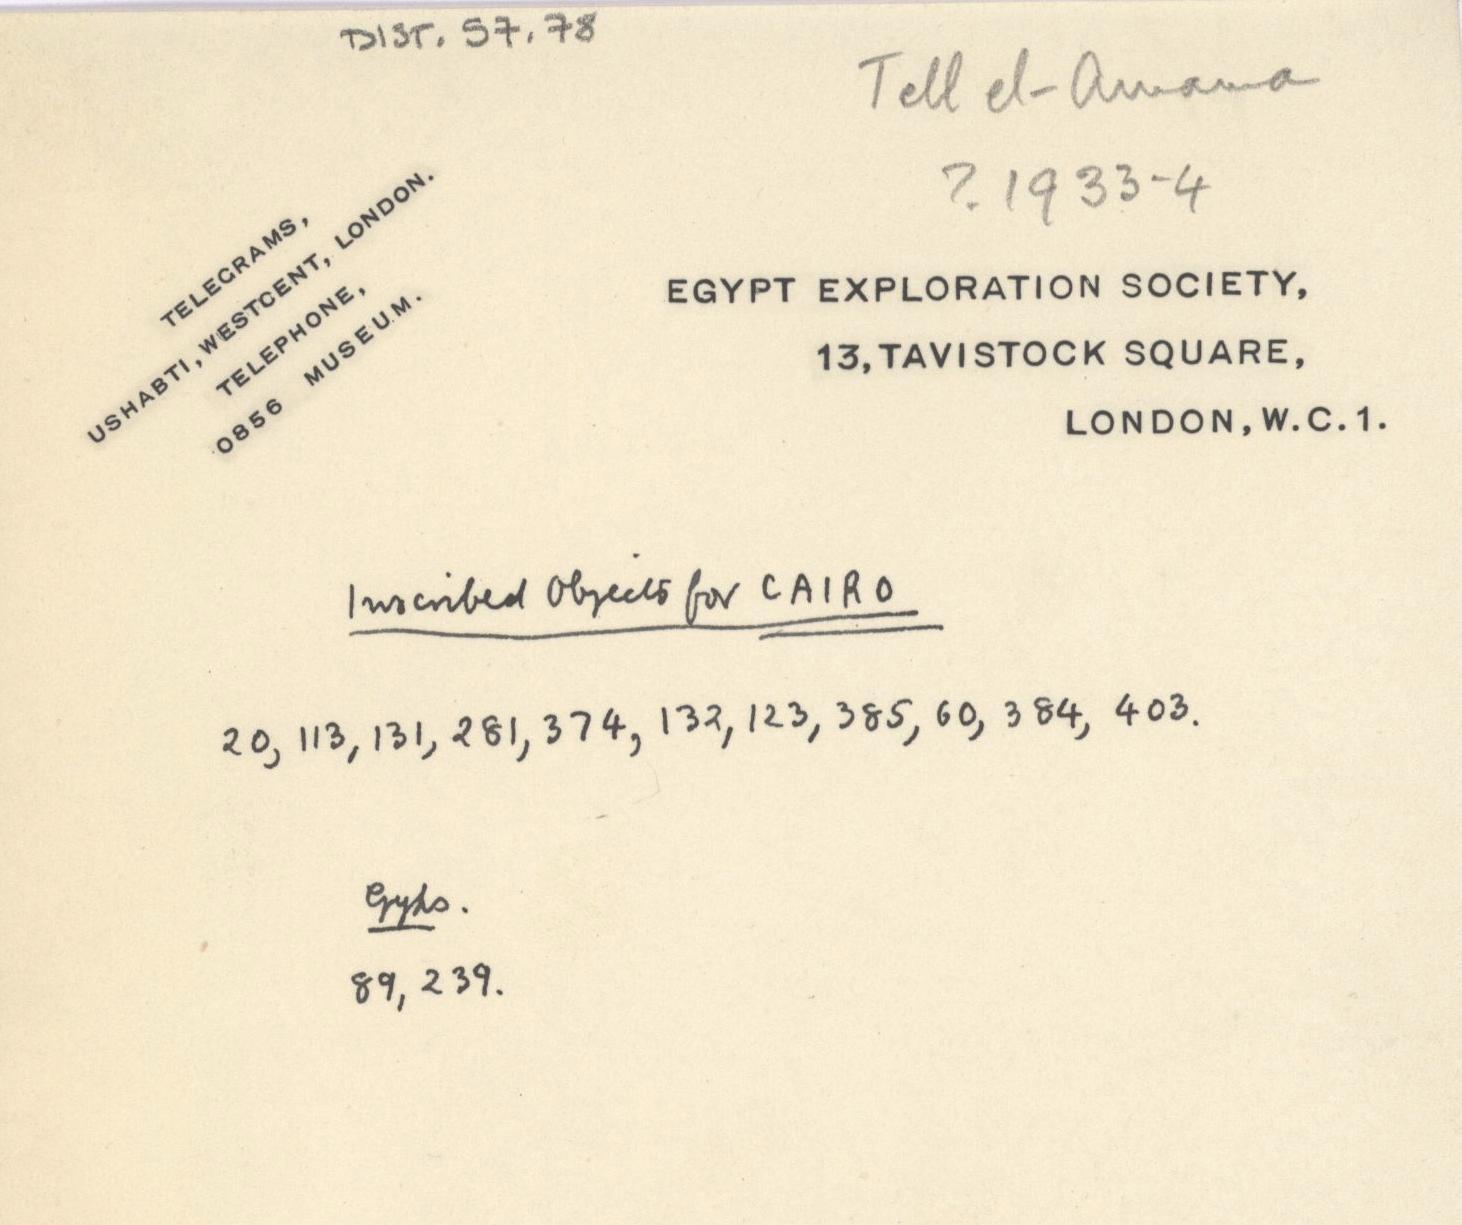 1931-34 el-Amarna DIST.57.78